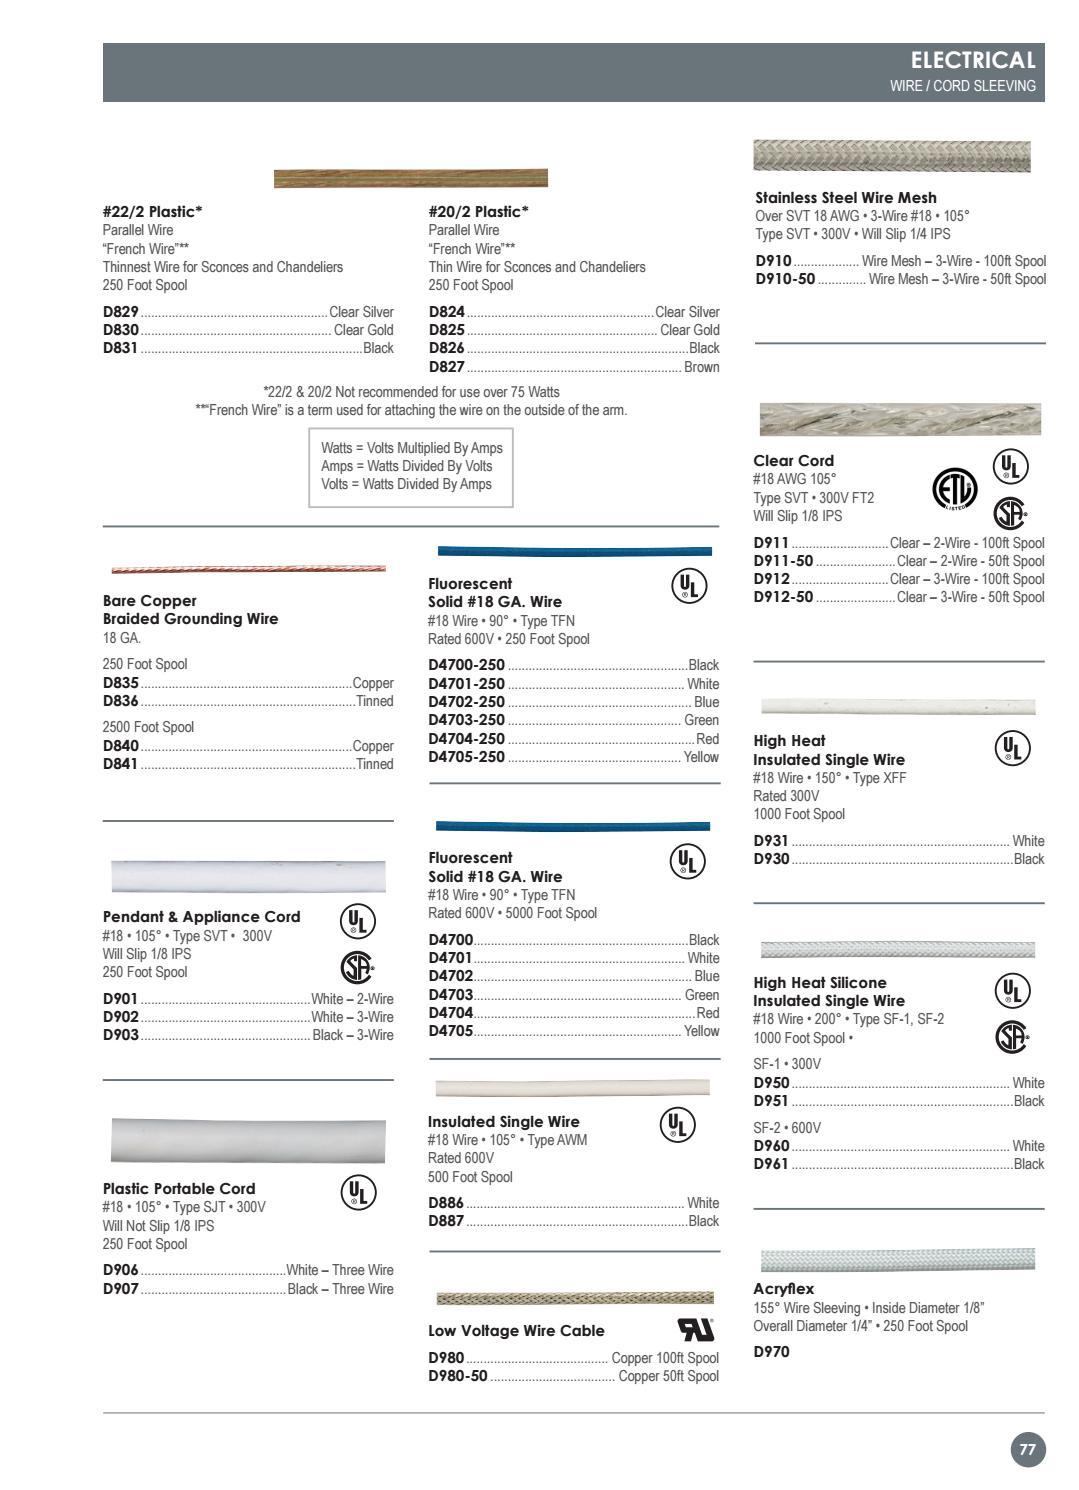 ADL 2015 Catalog \